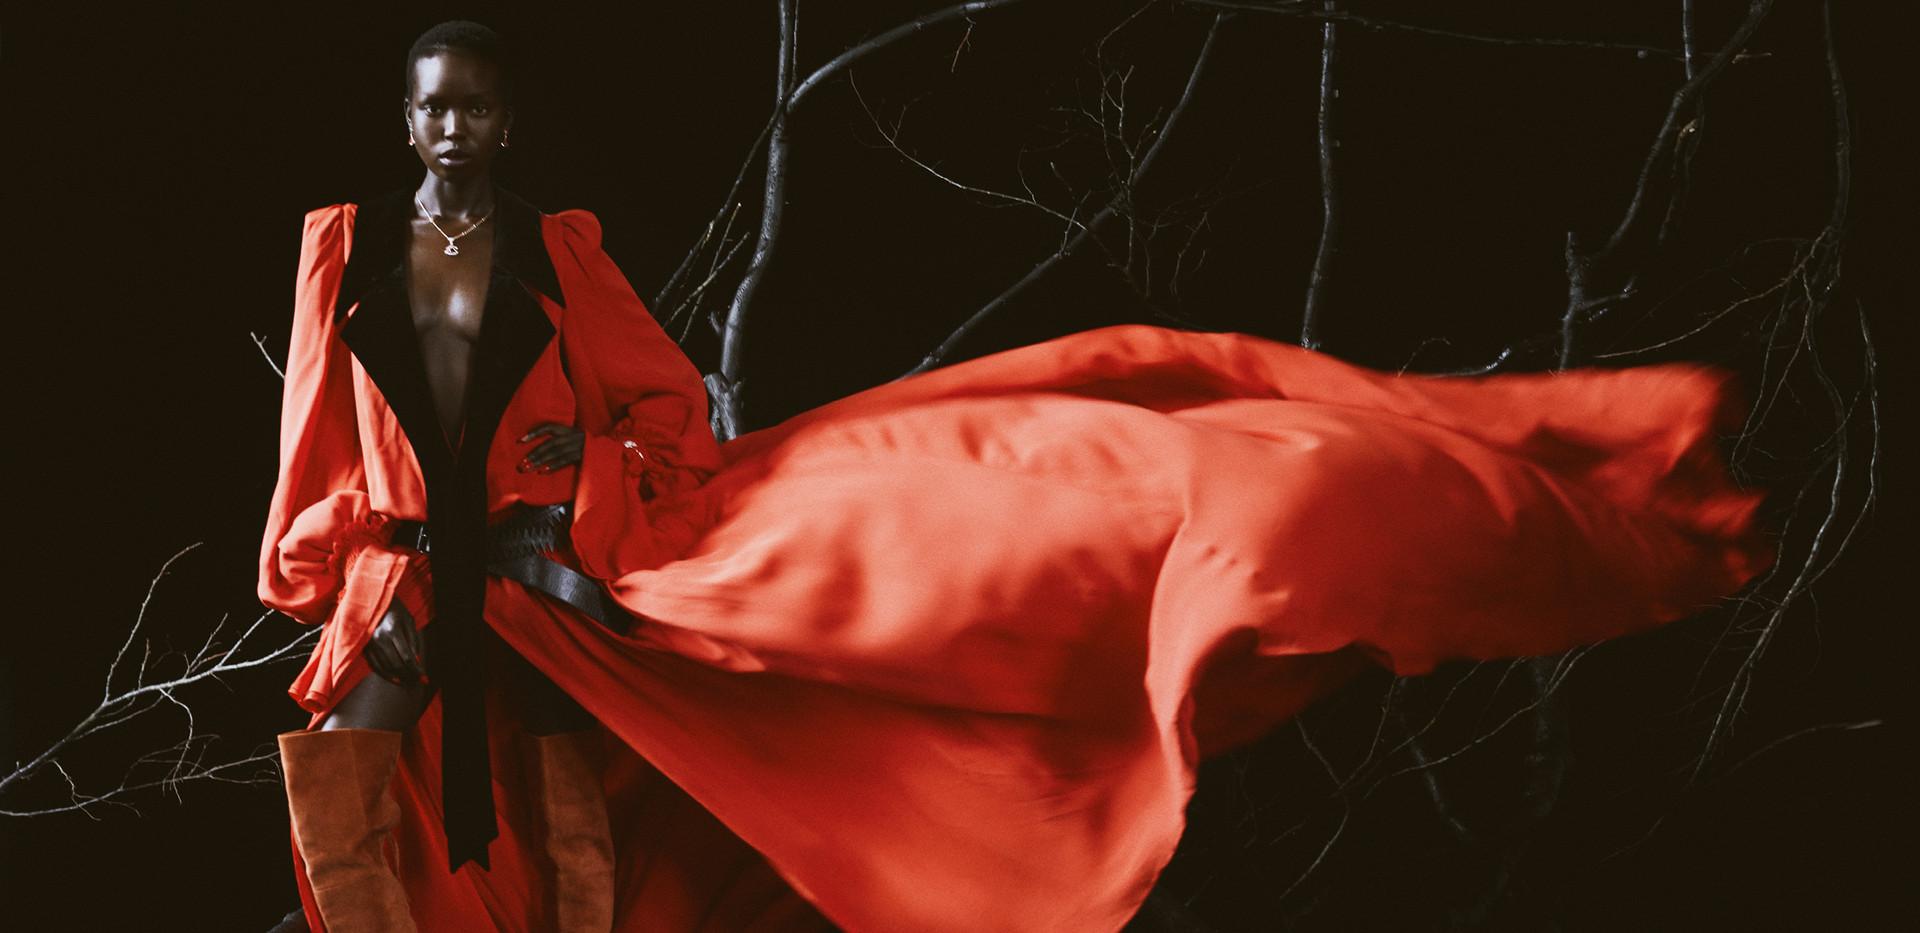 Photographer: David Reiss @davidreissphotography Stylist: Sayuri Bloom @addthatblack  Model: Ajok Madel @ajokmadel at Titanium Management  Casting director: Aleks Ivanof @ivanof_aleks Makeup Artist: Barrie Griffith @barriegmakeup Hair stylist: Sam Roman @manwigs  Manicure: Abena Lopes @abena_lopez_nails  Set designer: Lucy Wheeler  Video operator: Edward Japp @eddy_japp Assistant: Tayo Nelson Location: The Archives, London